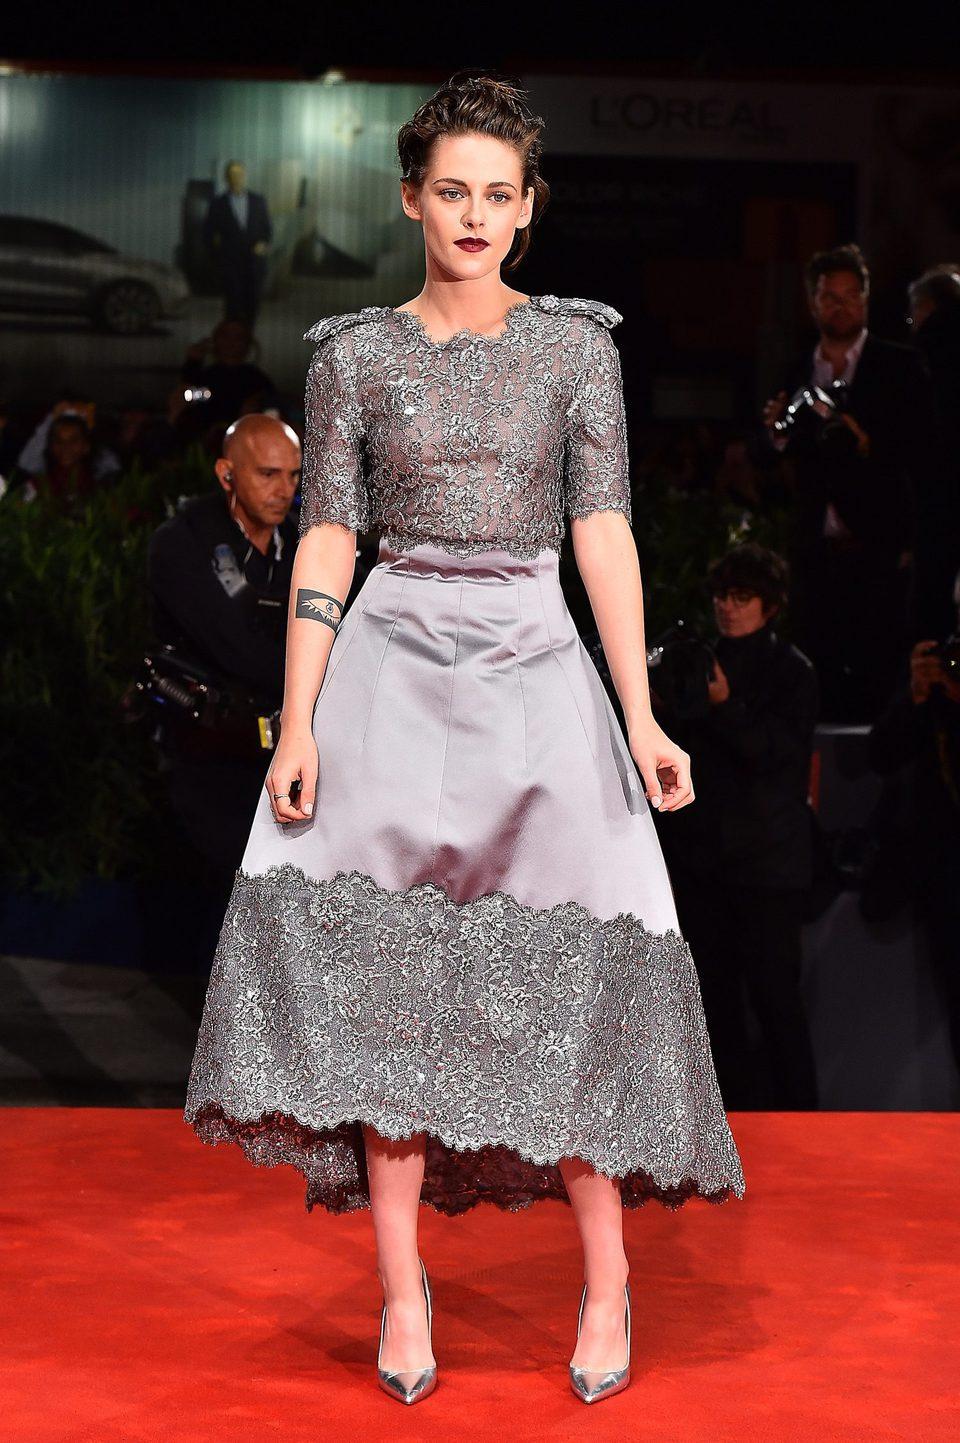 Kristen Stewart at the 72nd Venice Film Festival